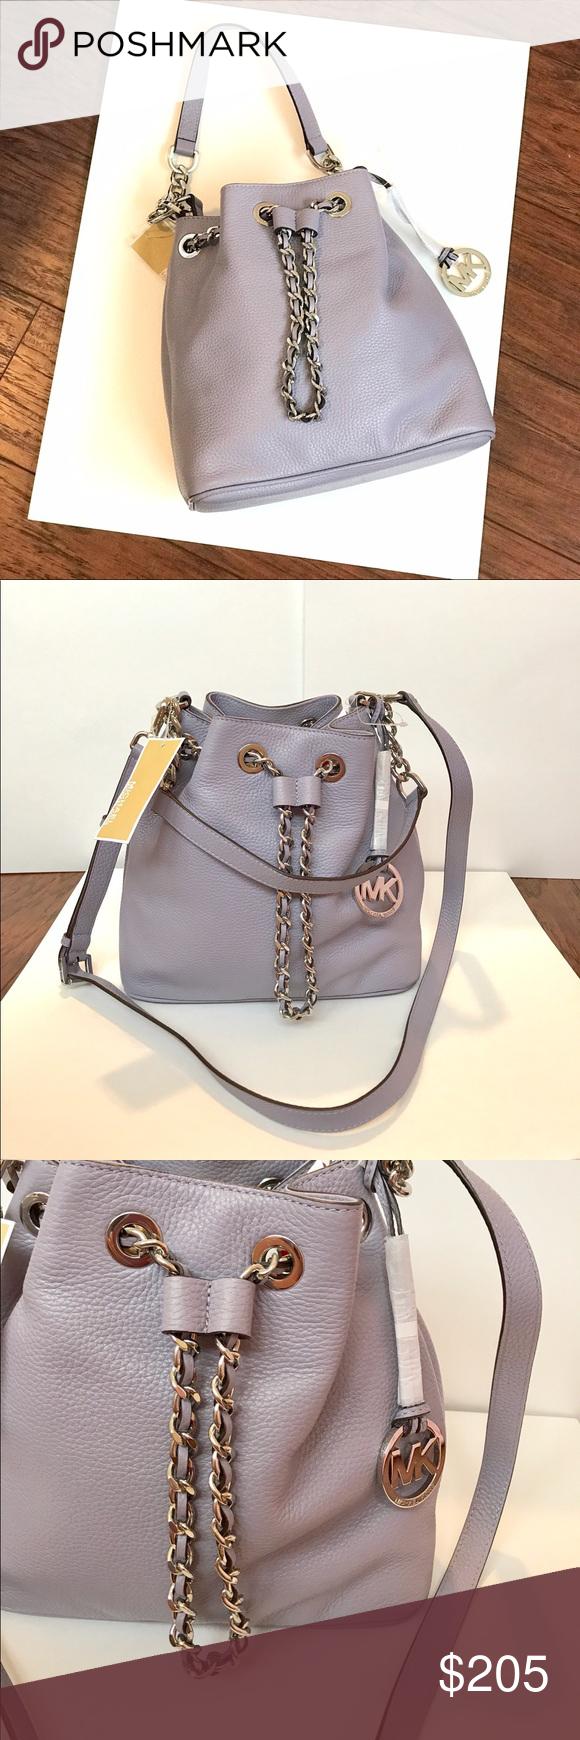 d3991a8e5faafe ... Brown 🎉HP🎉MICHAEL KORS Lilac Frankie Md Drawstring Bag Guaranteed  Authentic! Beautiful Michael Kors ...